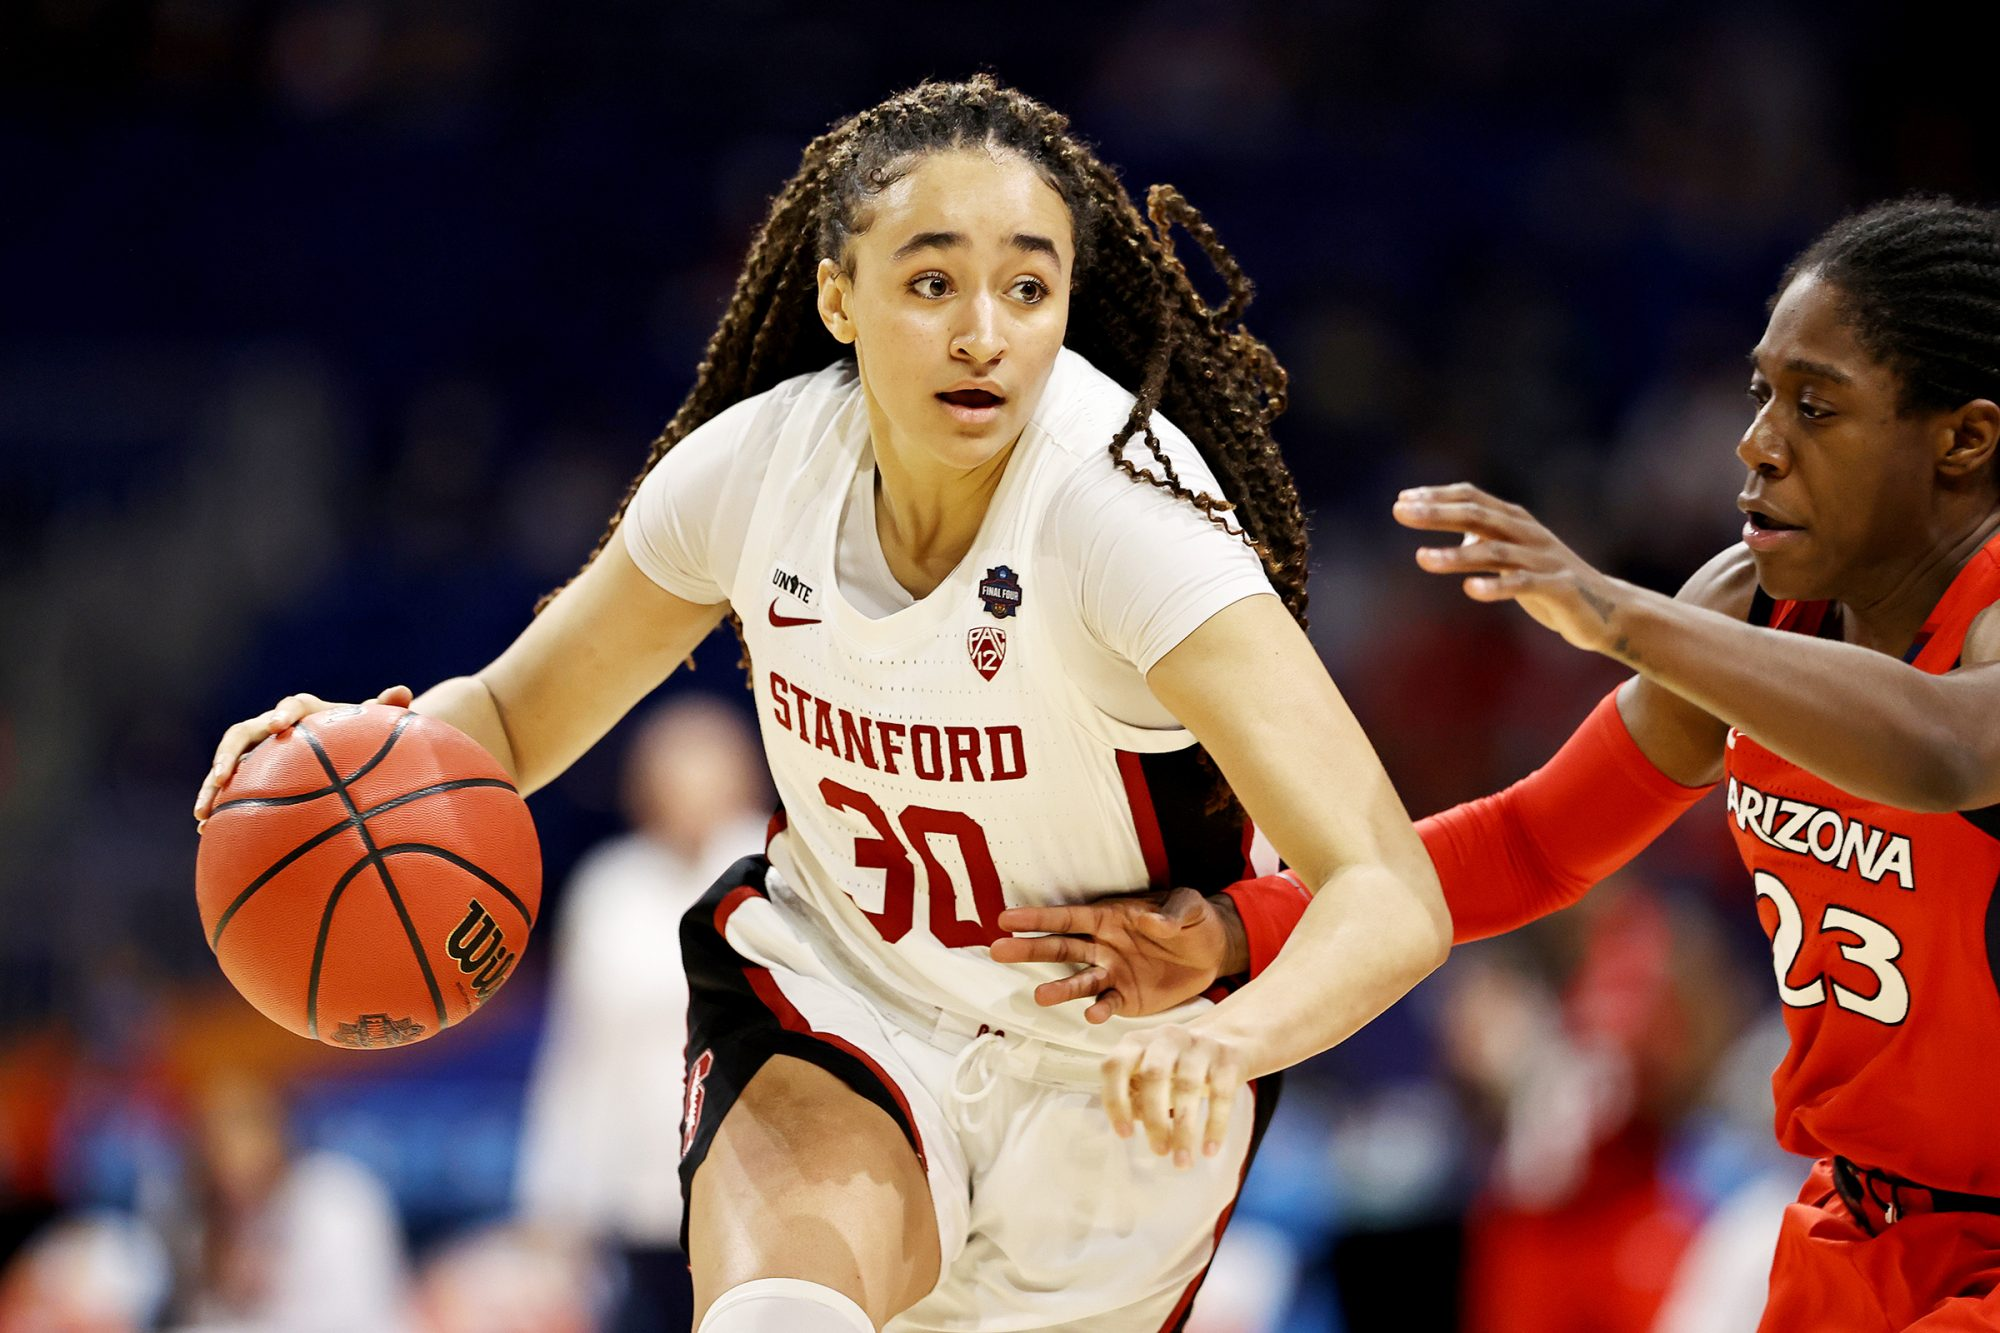 Stanford's Haley Jones 'Still on a High' After Winning NCAA Basketball Championship: 'No Sleep'